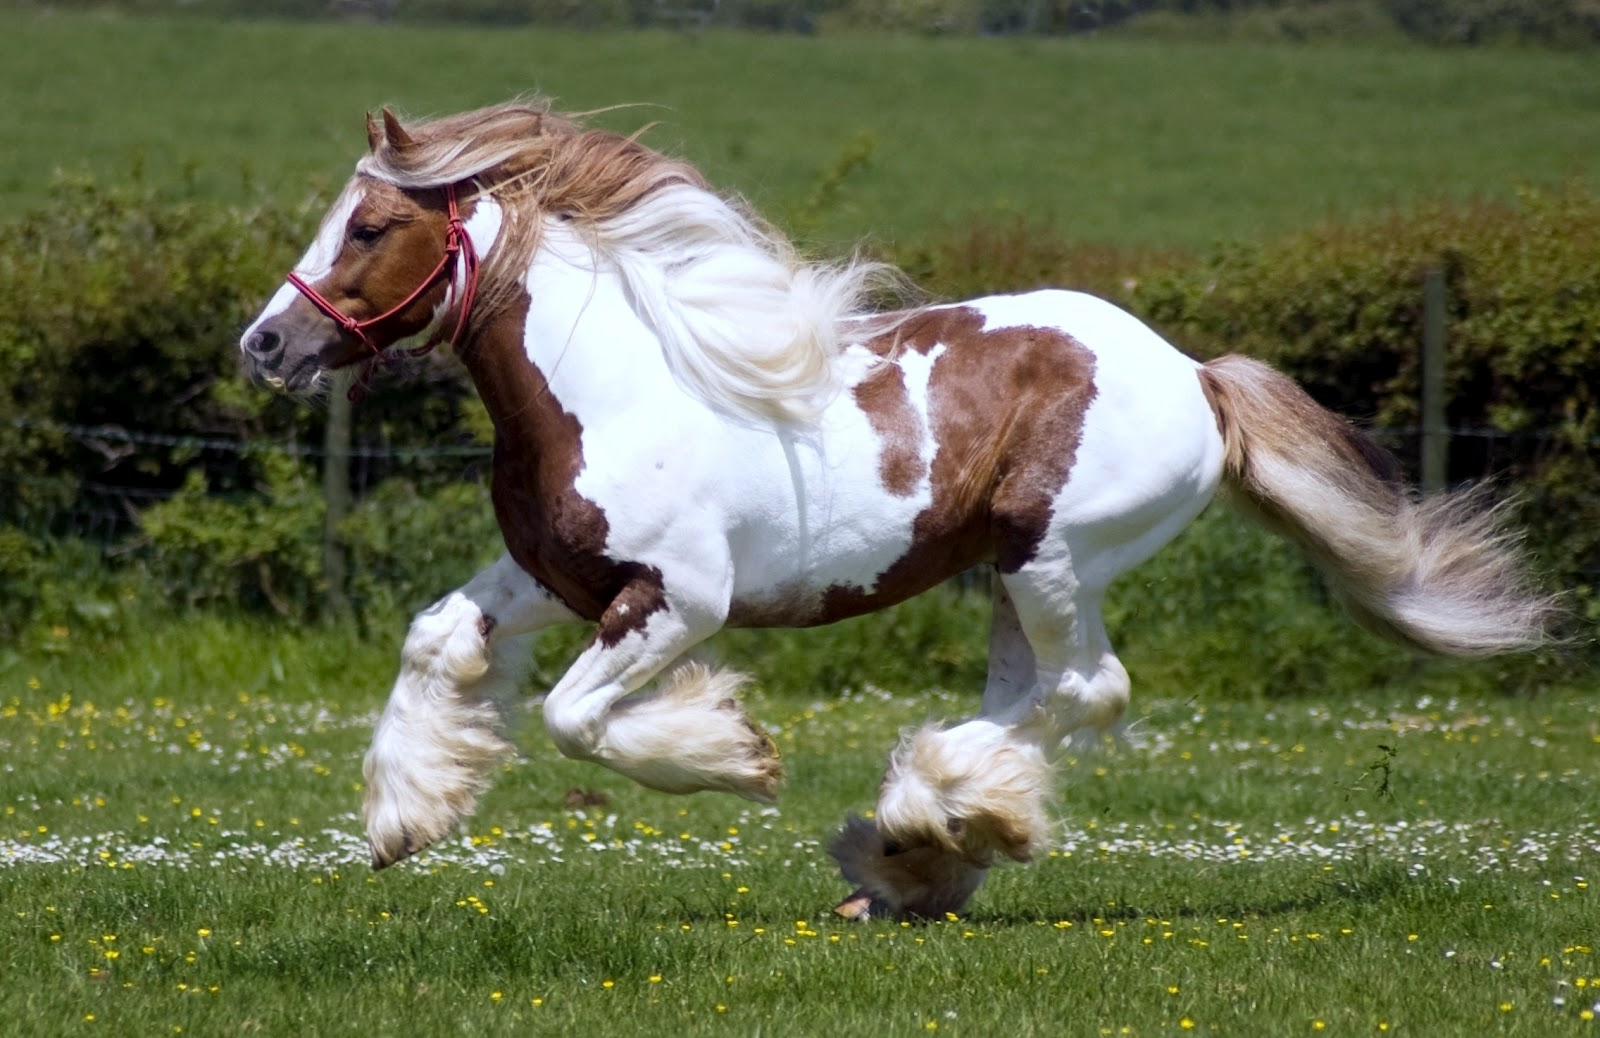 horse wallpaper arabian horse wallpaper beautiful horse wallpaper 1600x1038